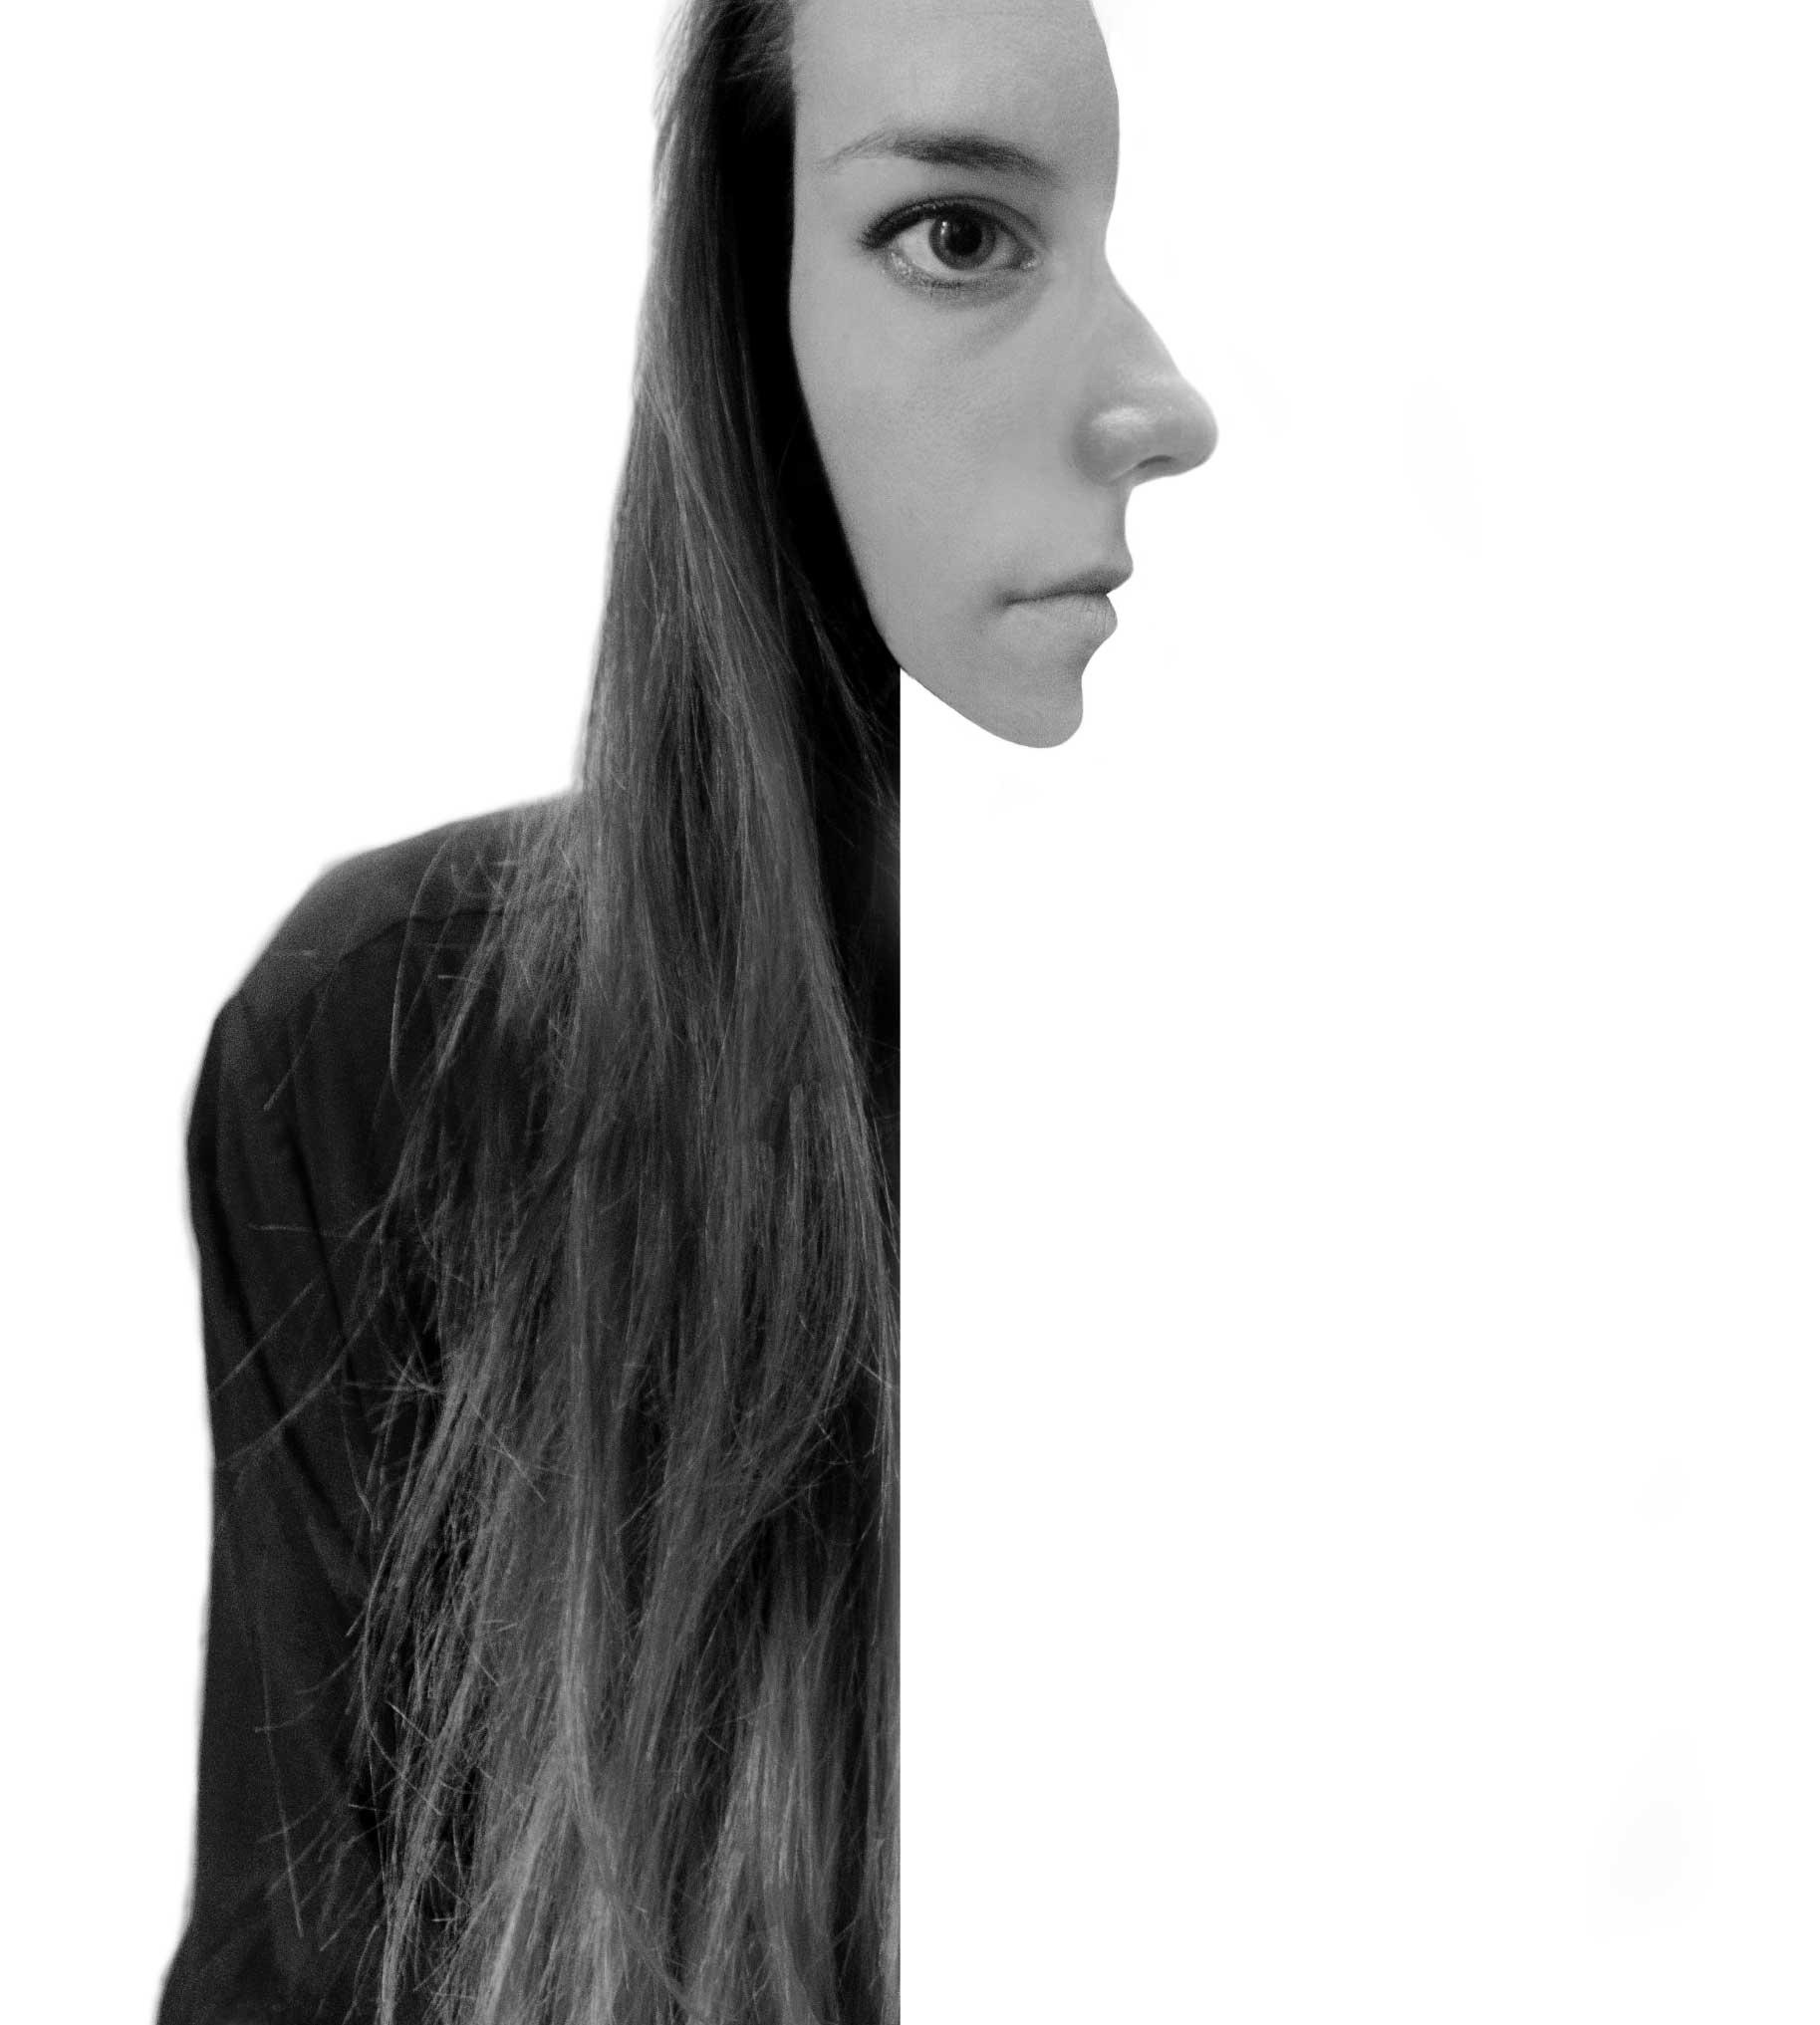 Self_Portrait_Illusions_web_1827.jpg